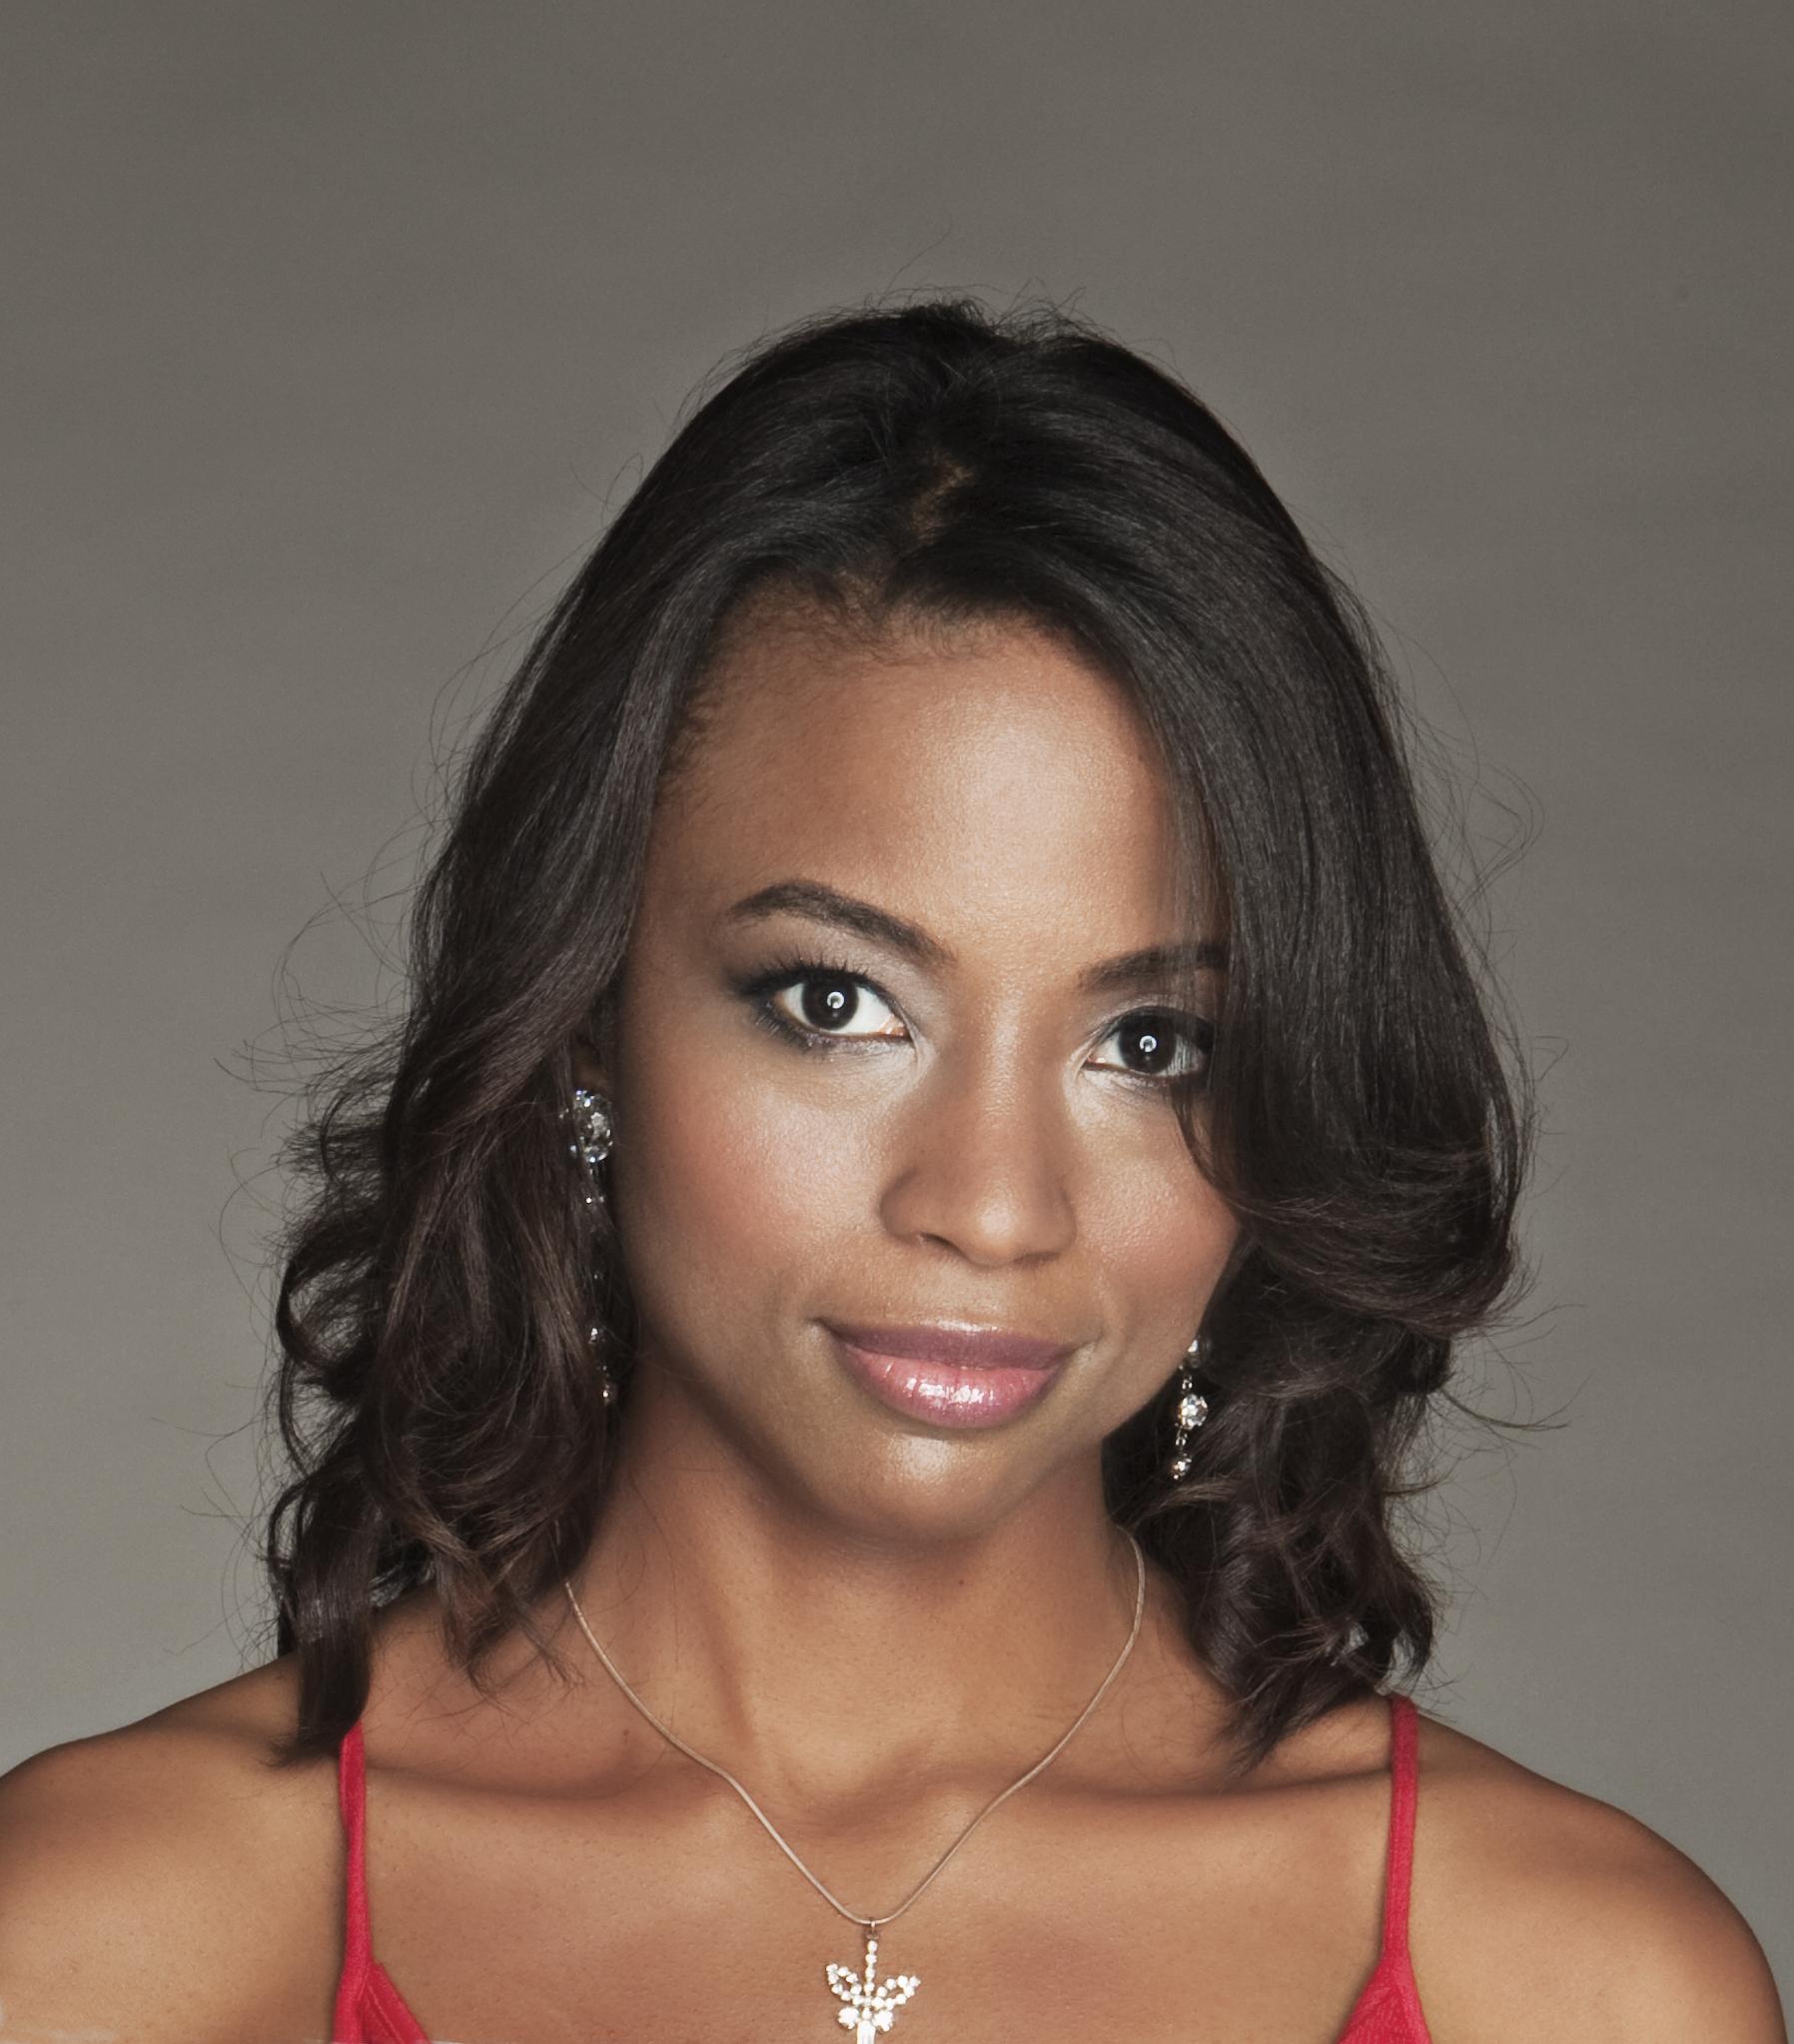 Vocalist Tiffany Austin